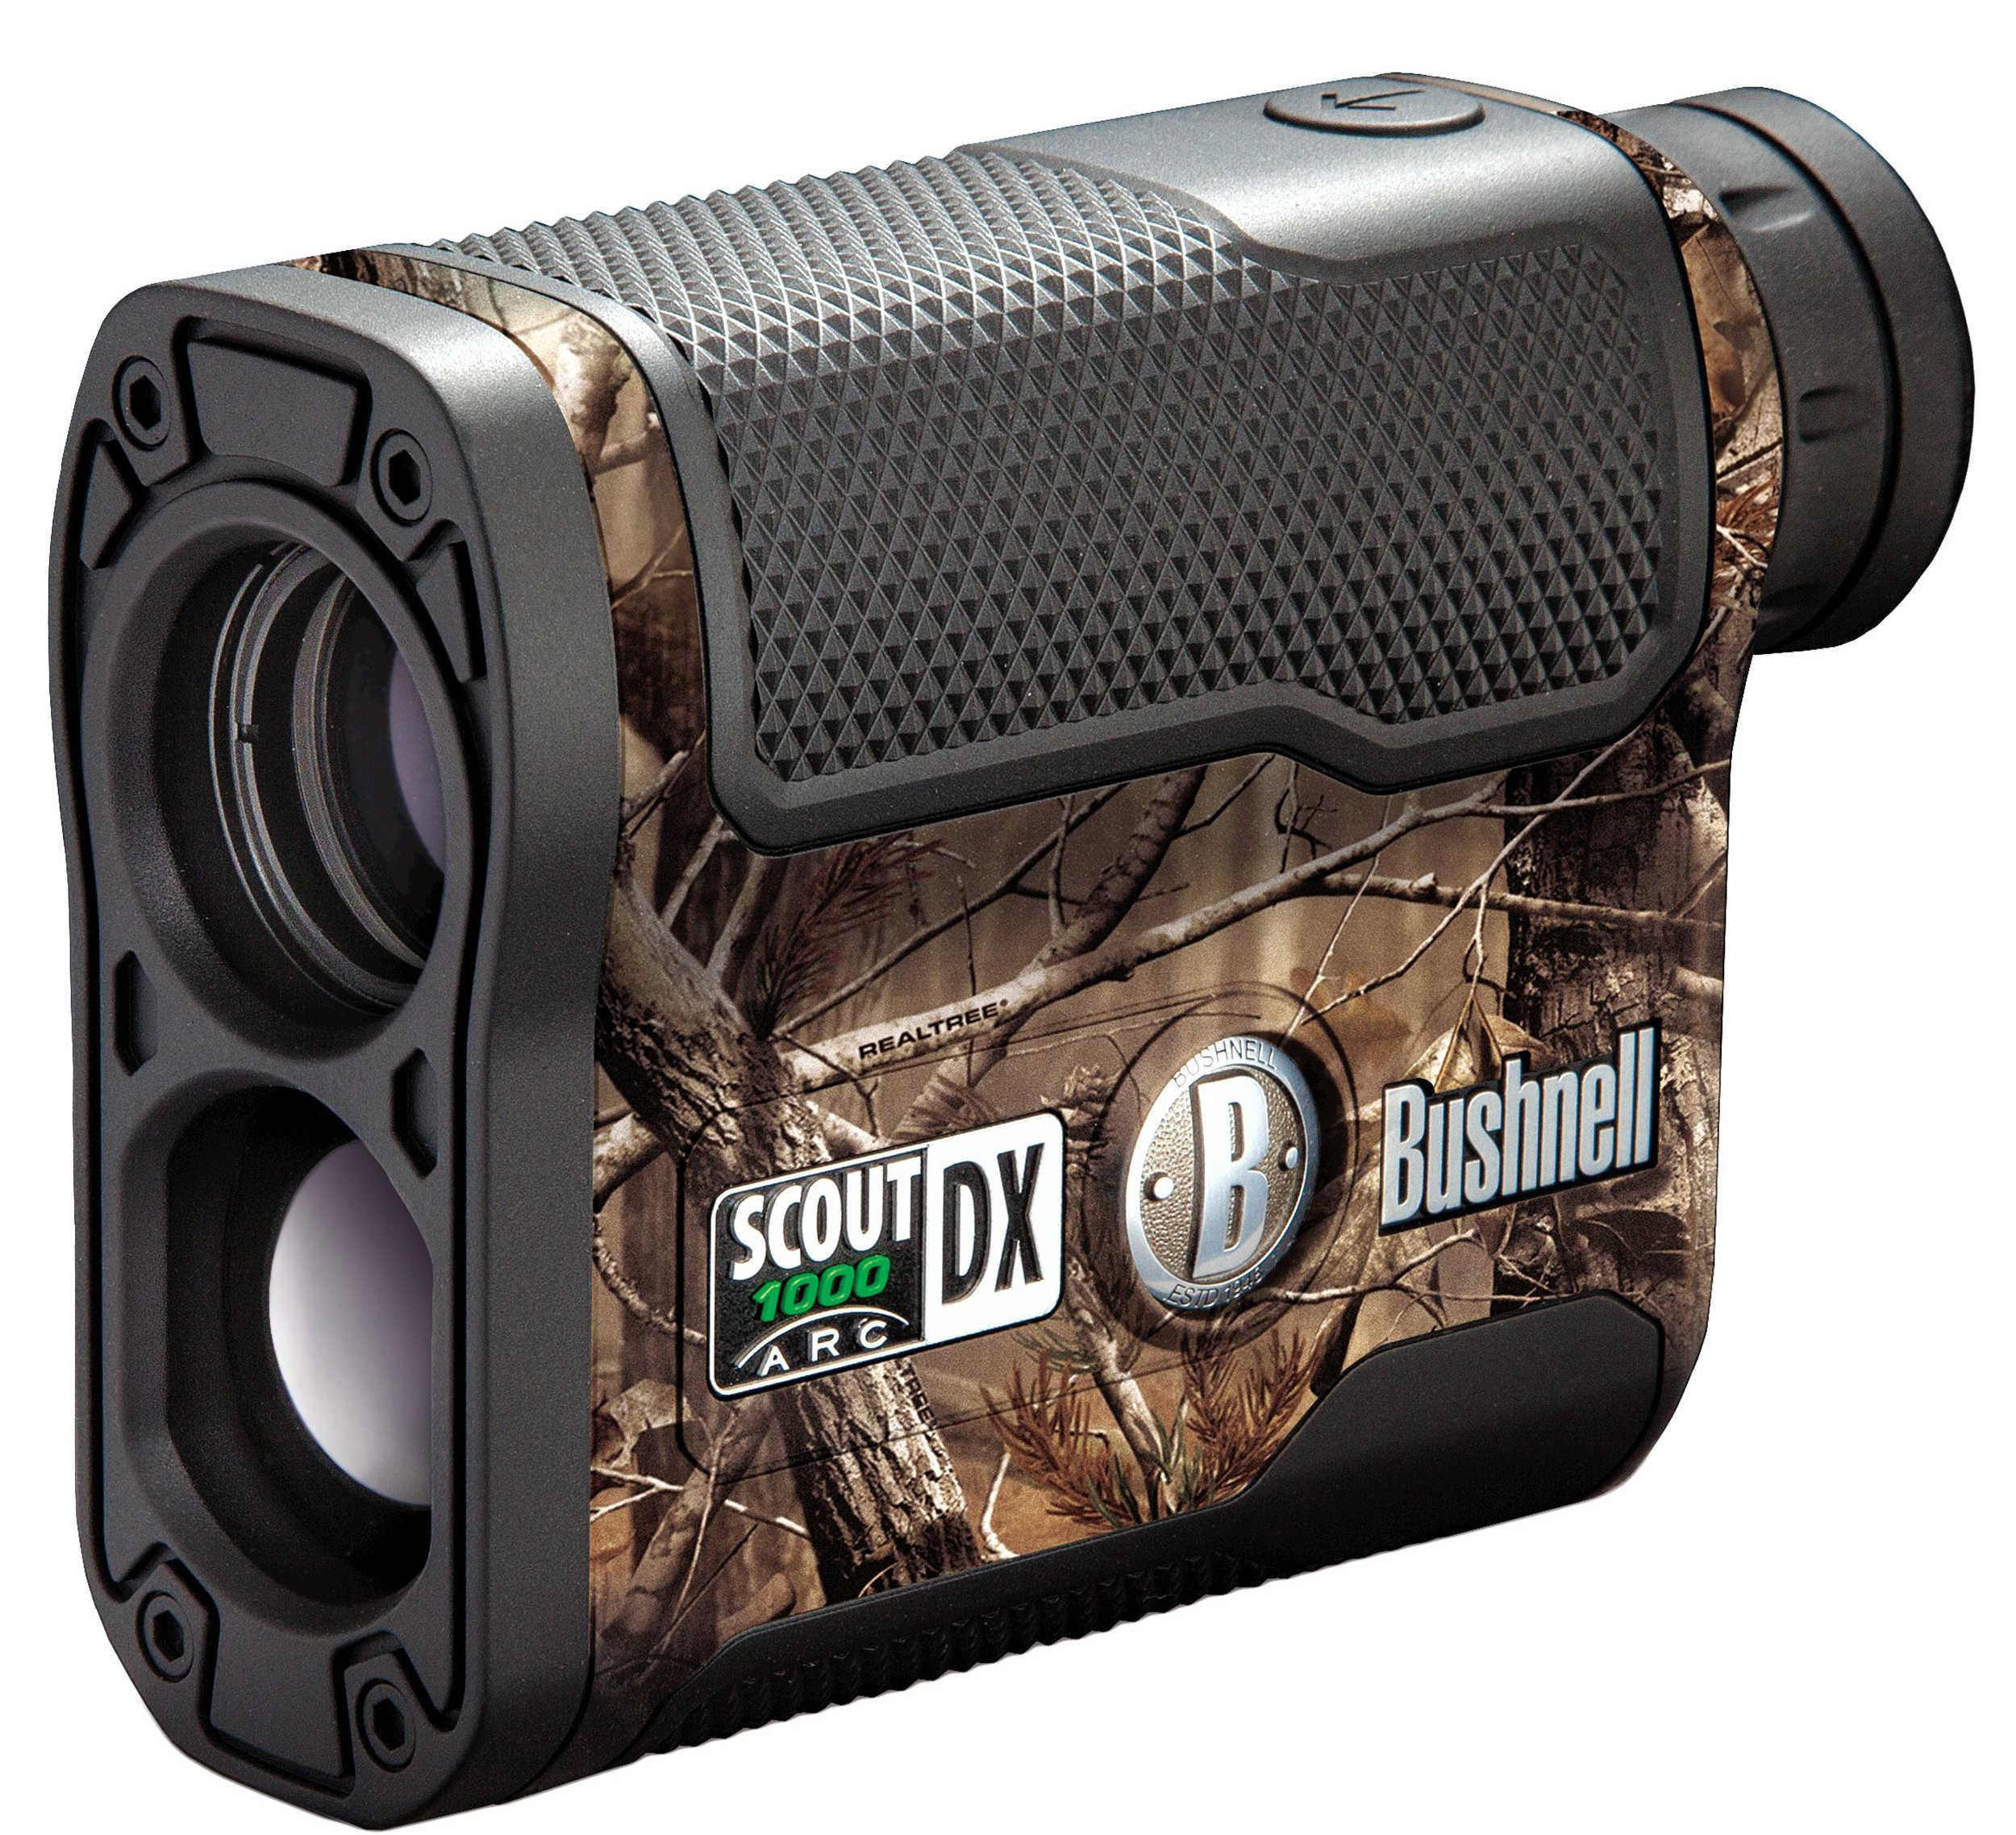 Bushnell Scout DX 1000 Rangefinder w/Angle Compensation 1000 Yds 6x20 Camo Model: 202356